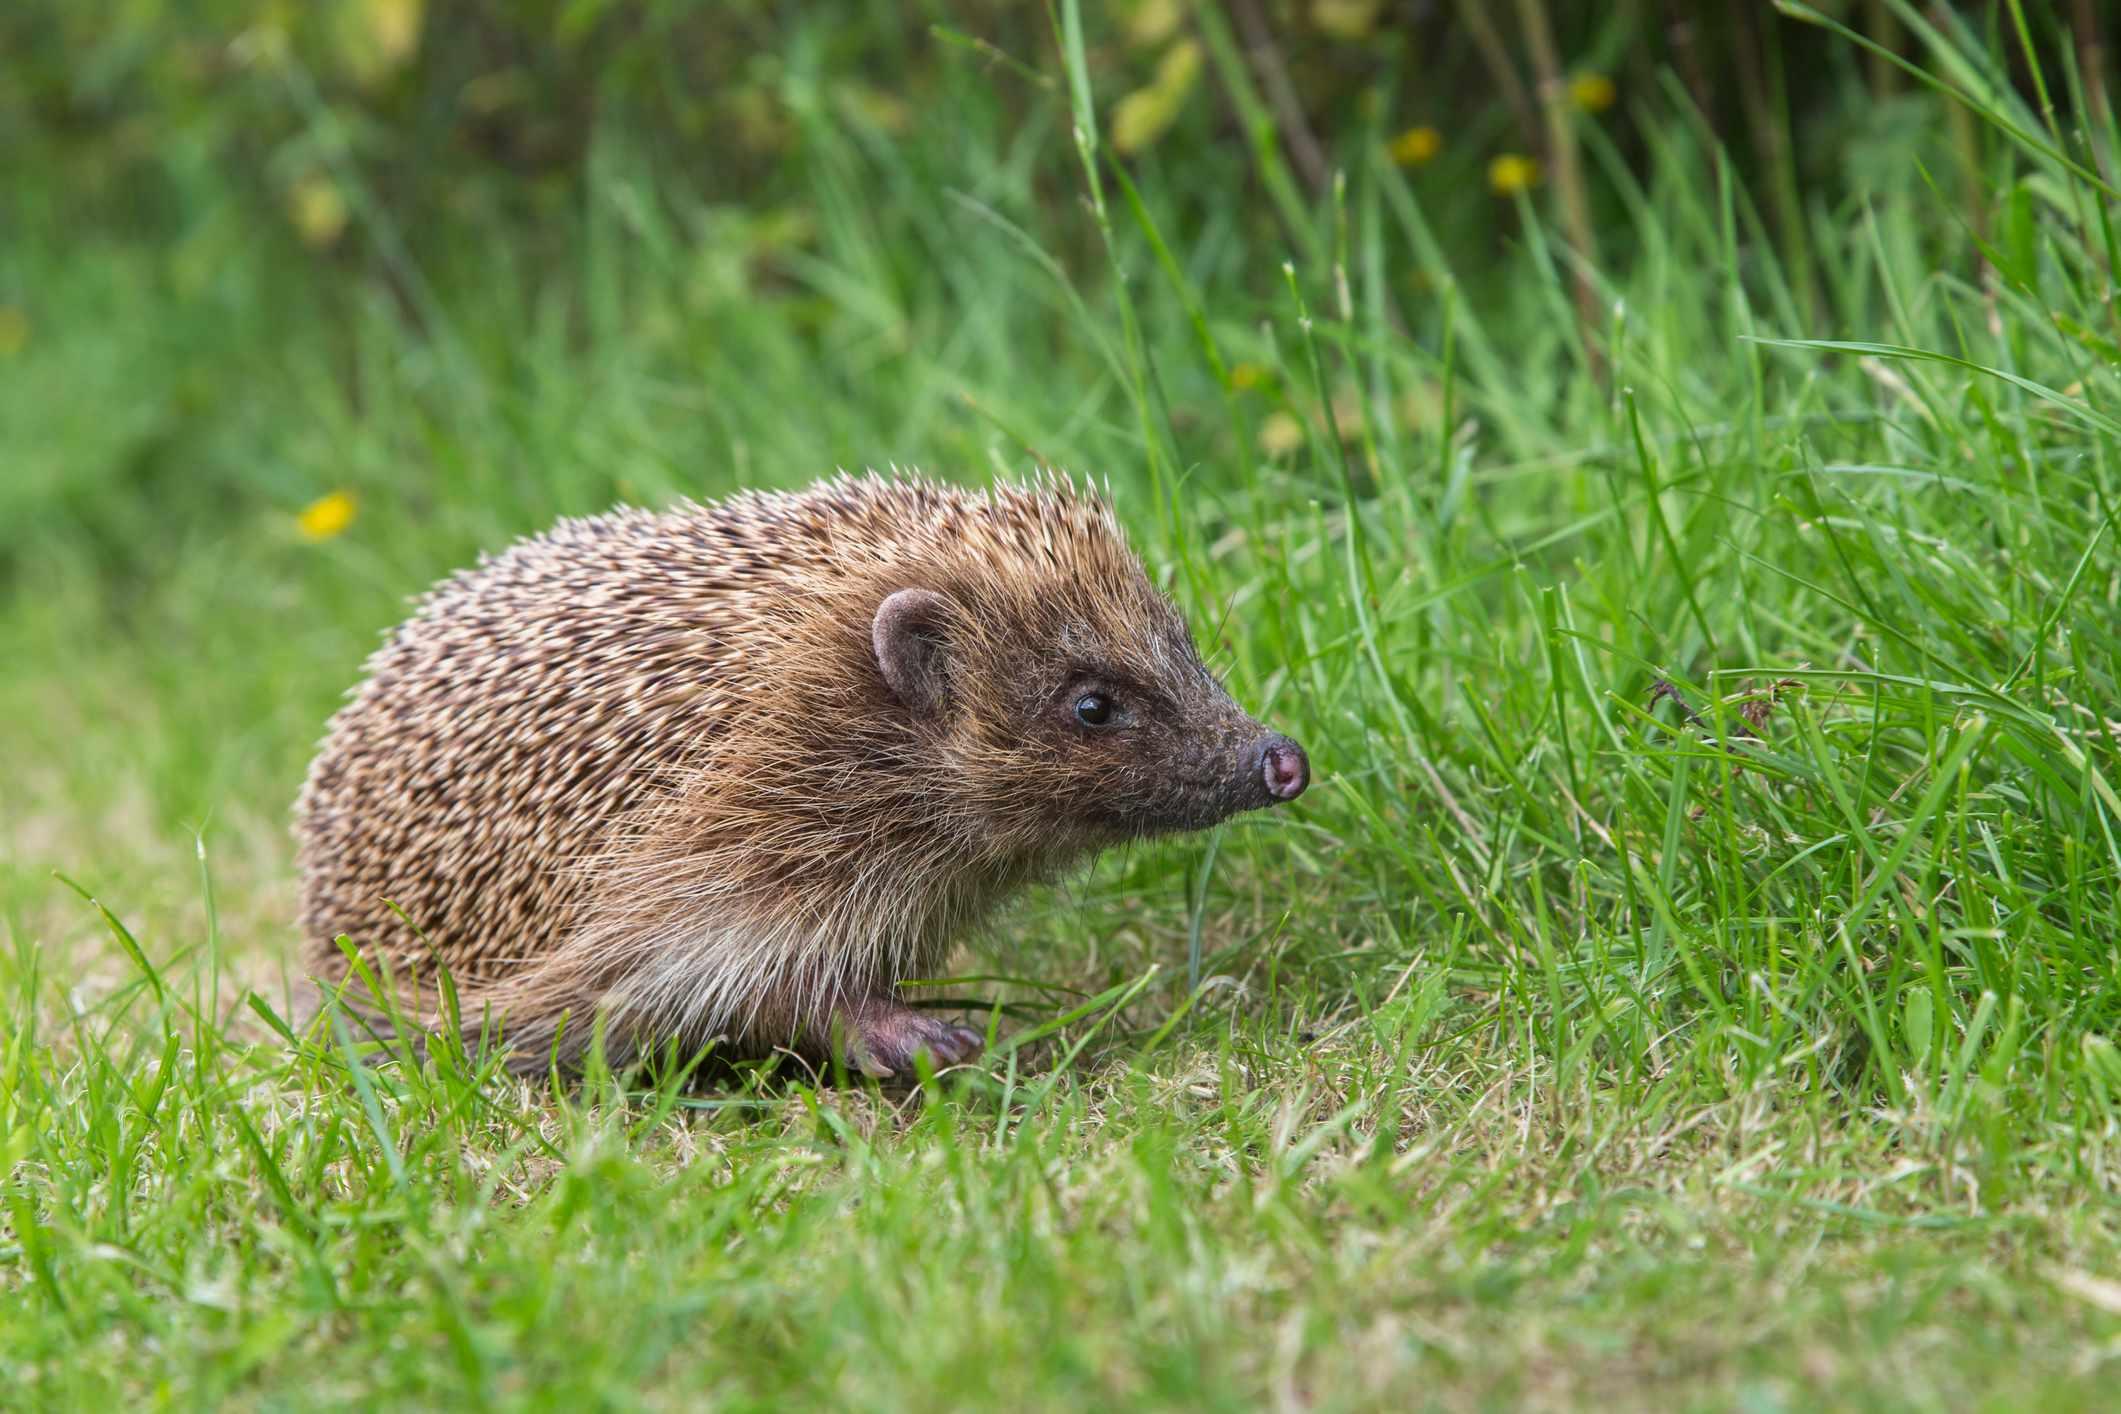 Hedgehog @ Ann & Steve Toon/robertharding/Getty